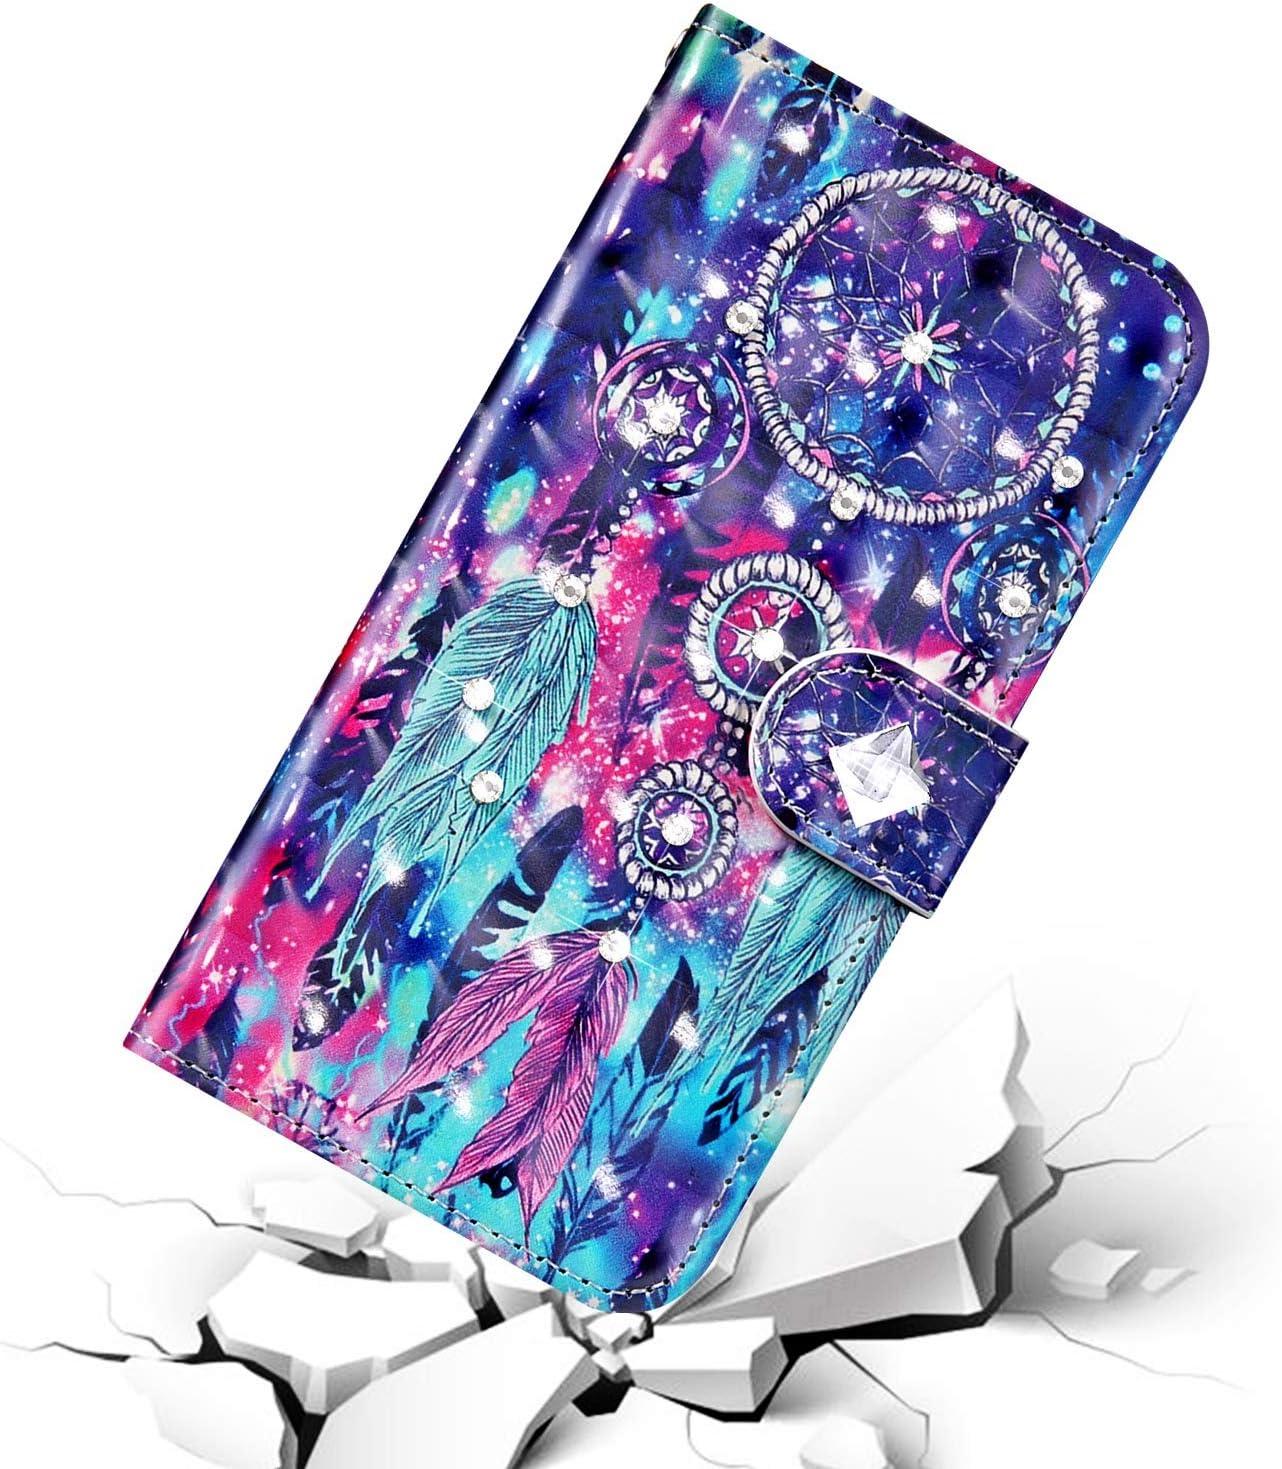 Surakey H/ülle f/ür Huawei P20 Lite 2019 Handyh/ülle Schutzh/ülle Klapph/ülle Gl/änzend Bling Glitzer Diamant Muster PU Lederh/ülle Brieftasche Flip Case Wallet Tasche Handytasche Kartenf/ächer,Blau Mandala